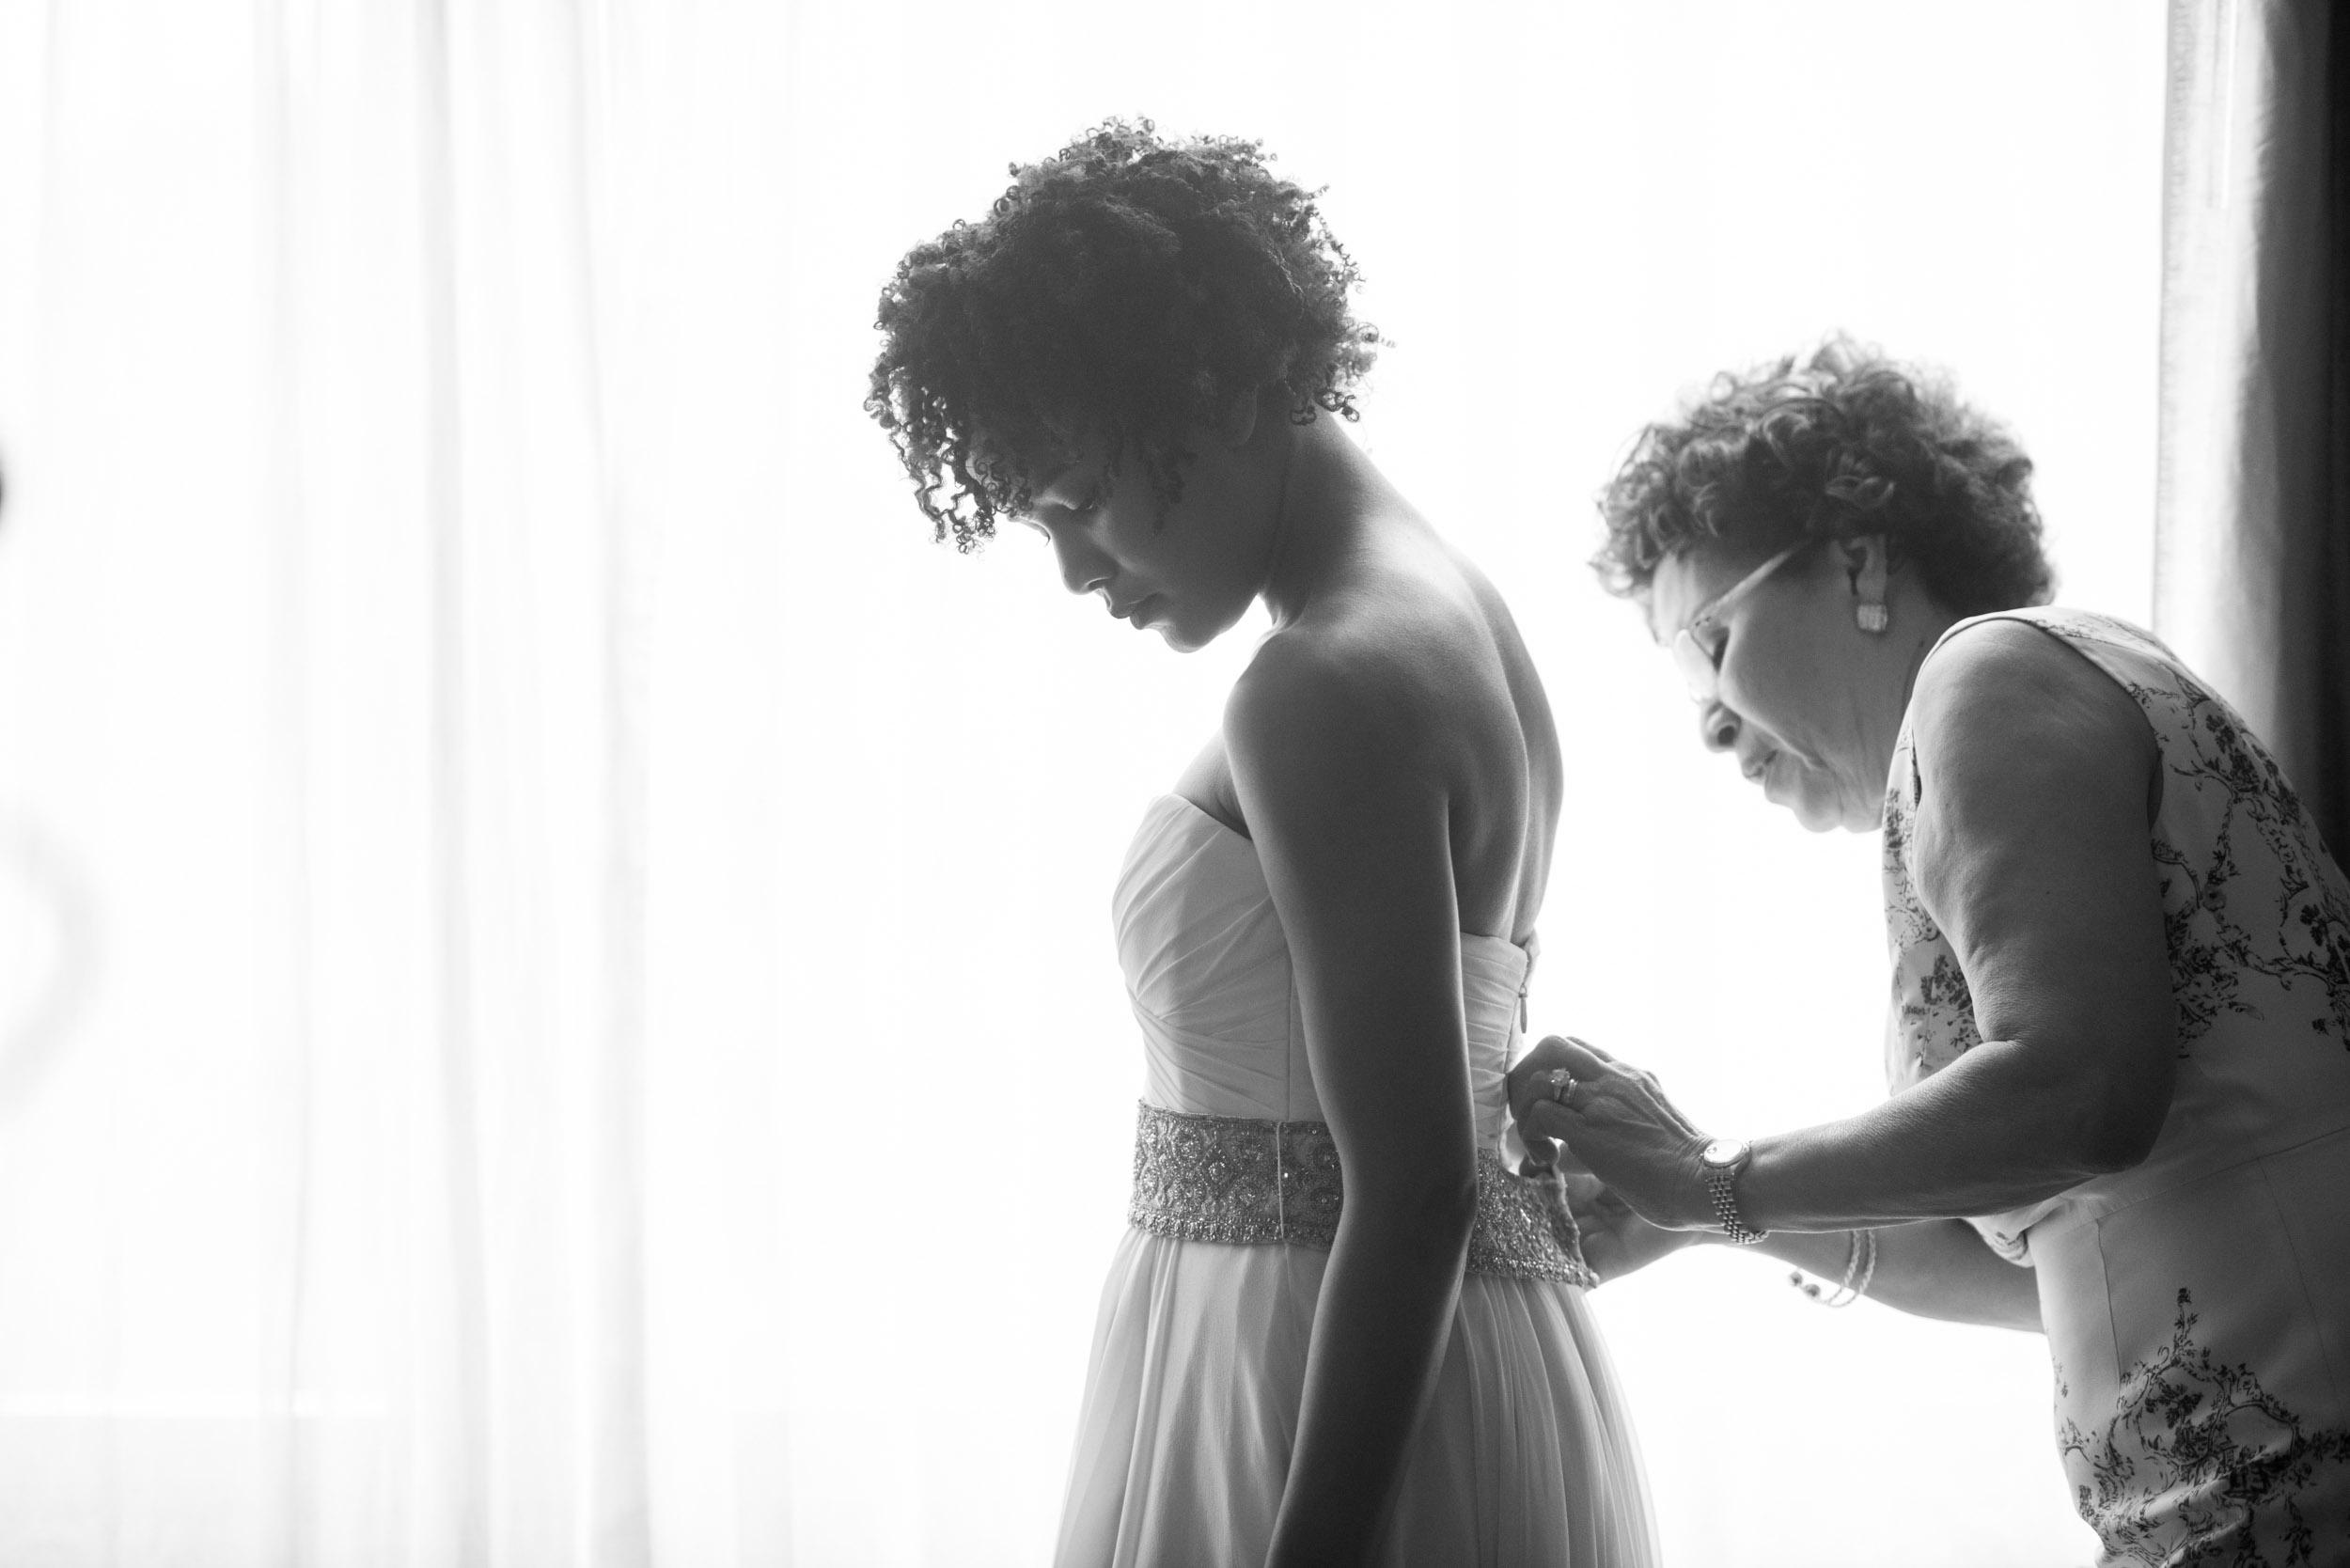 dc+metro+wedding+photographer+vadym+guliuk+photography+weddings-2024.jpg